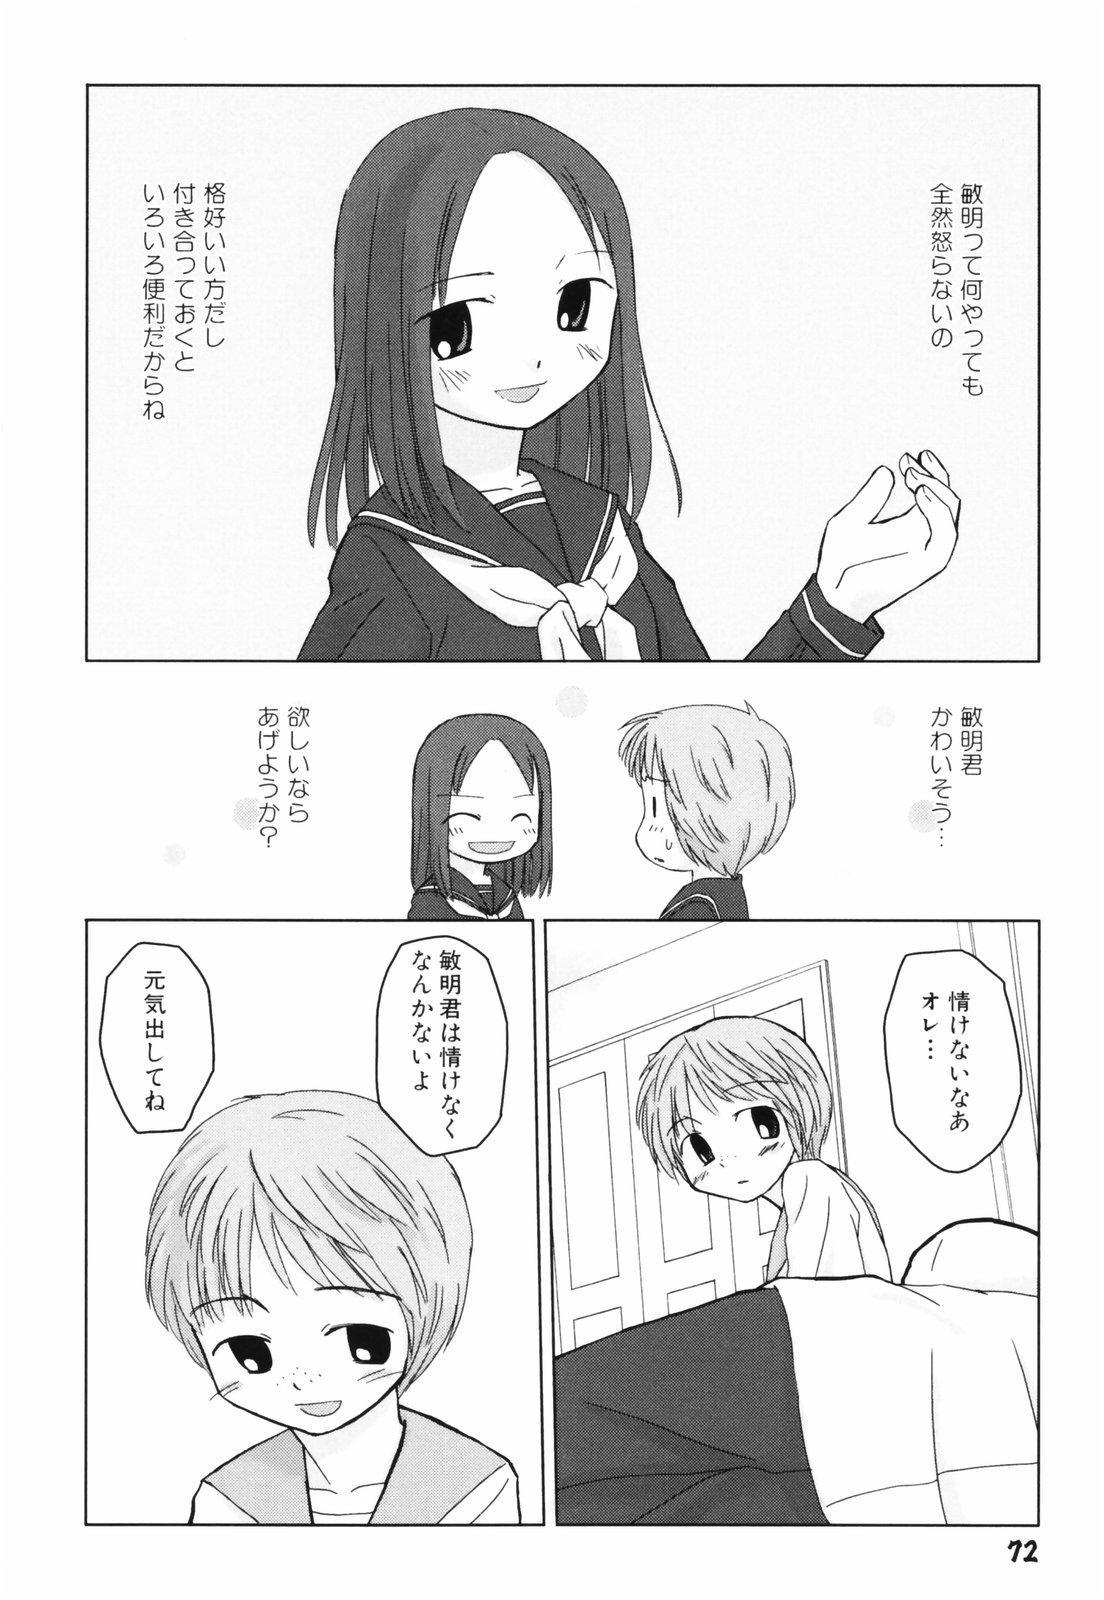 Hanjuku Shoujo 74